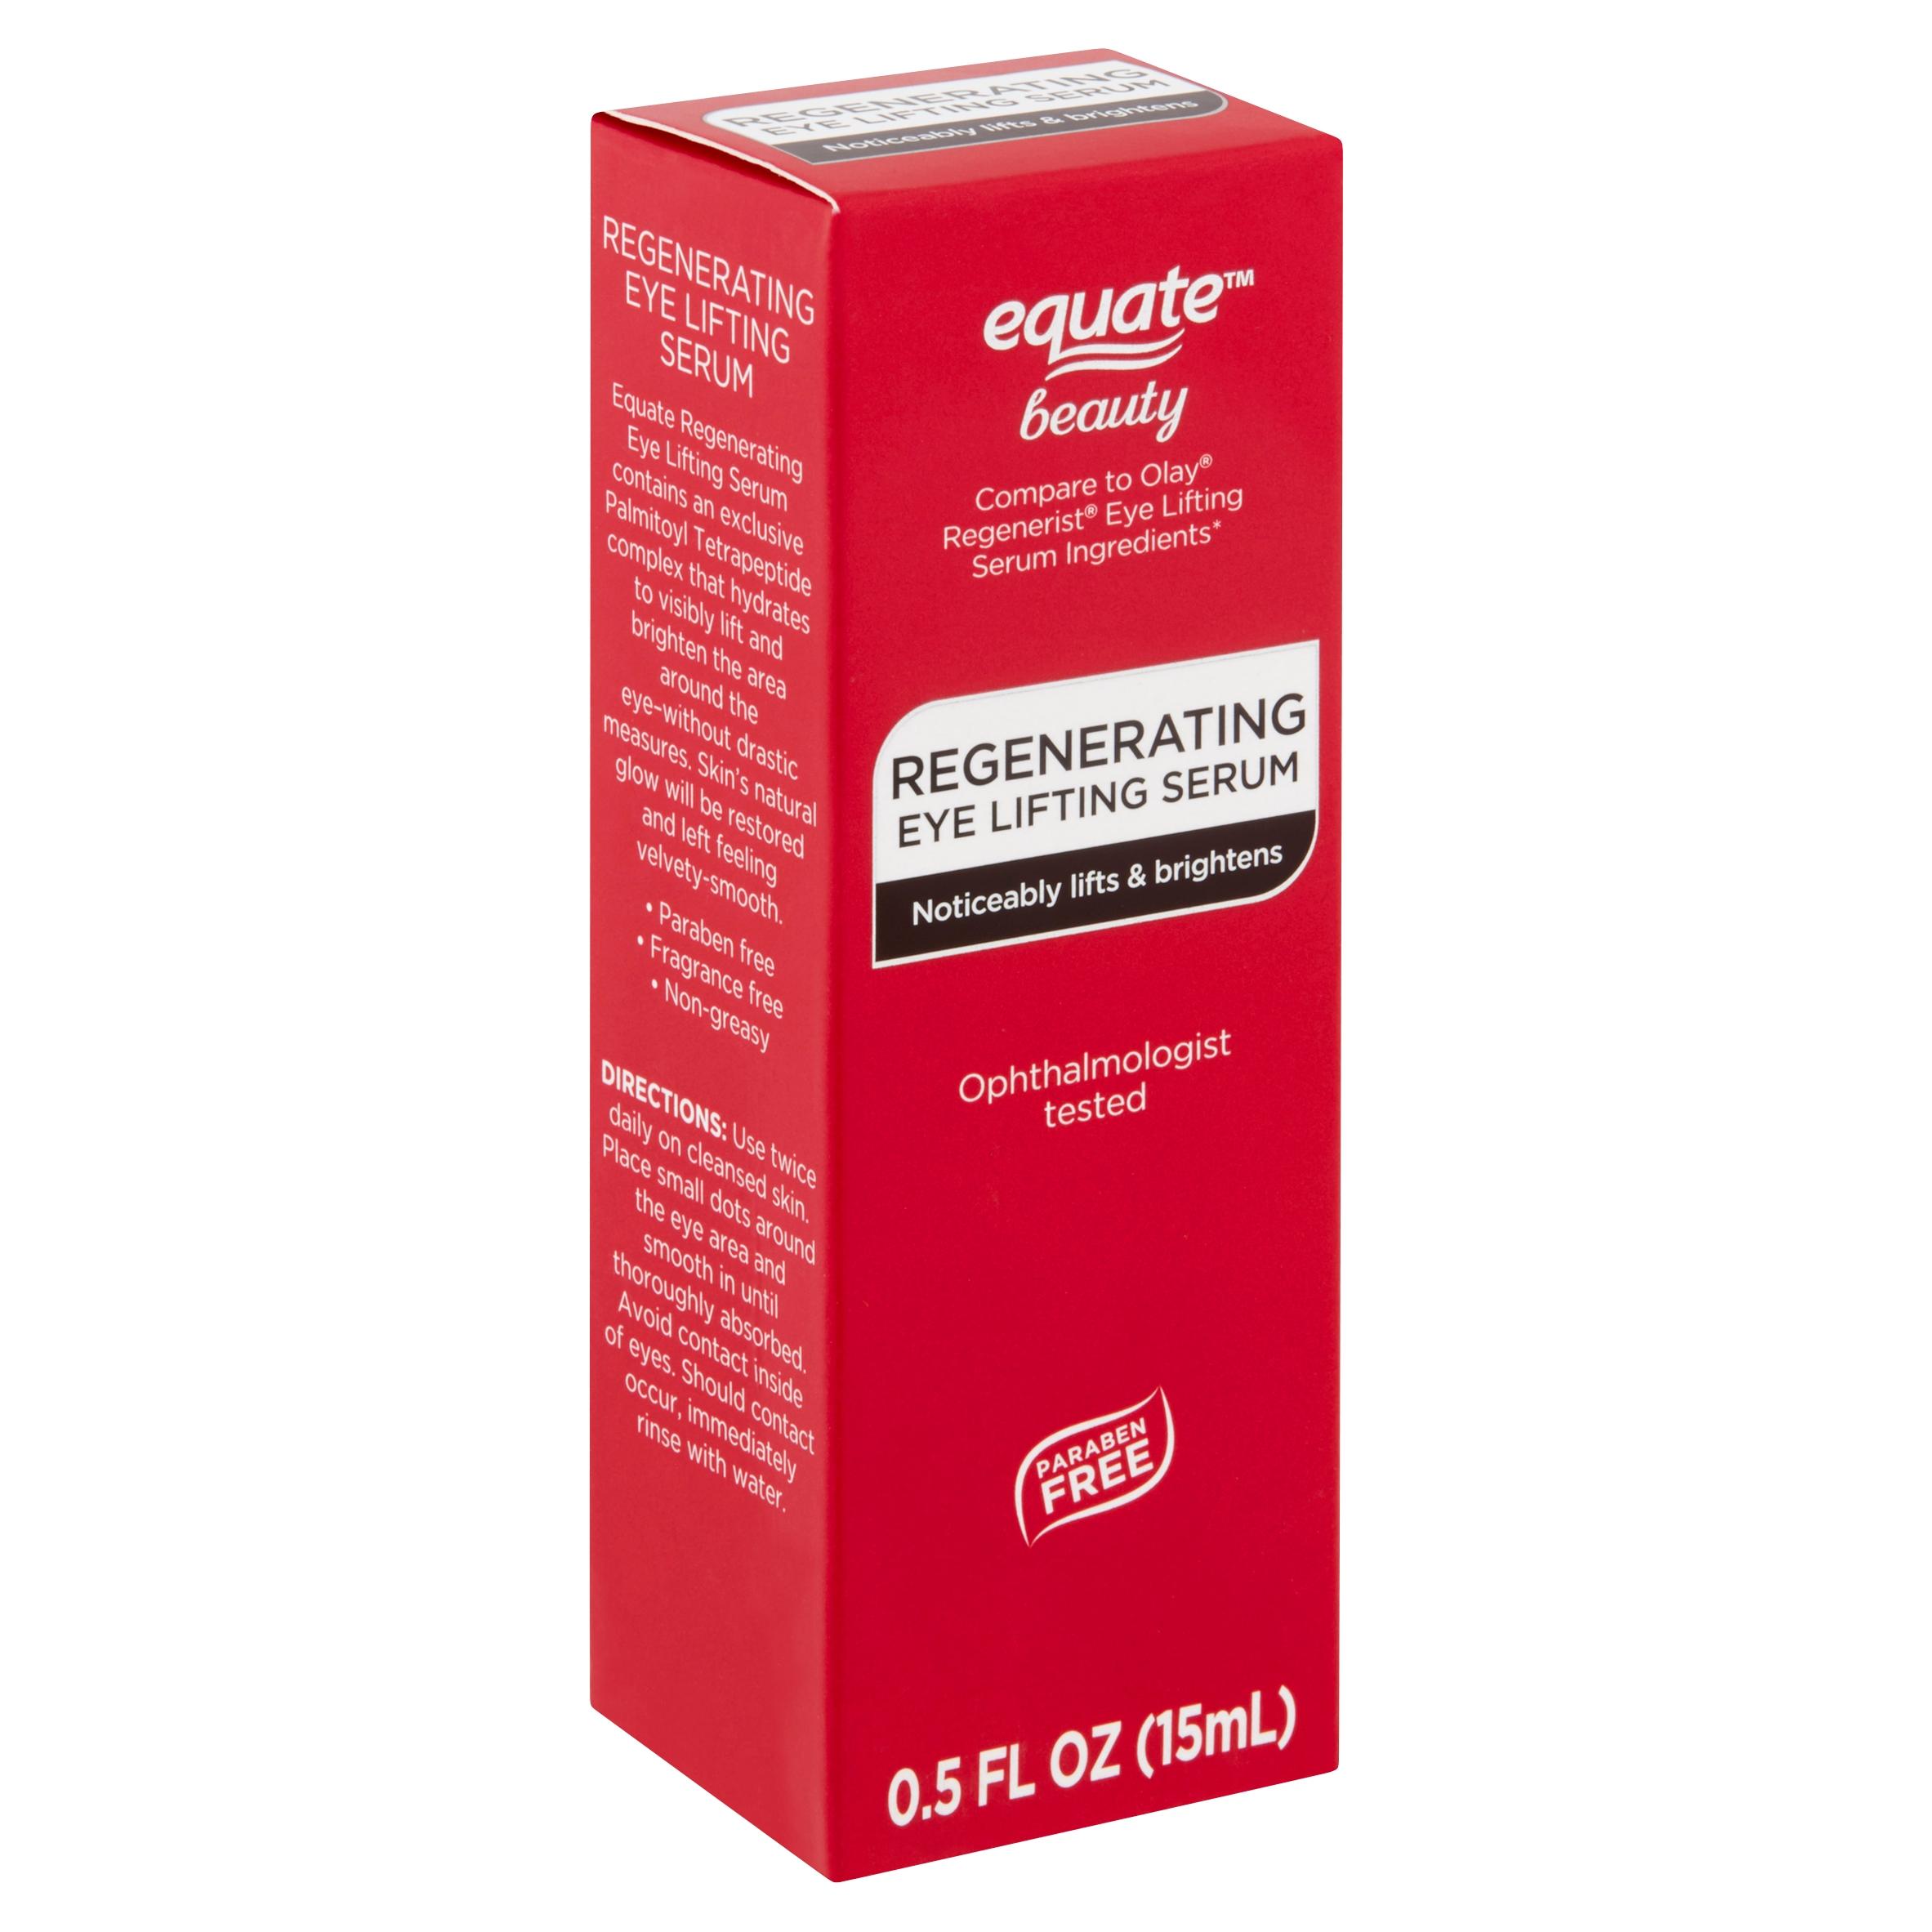 Equate Beauty Regenerating Eye Lifting Serum, 0.5 fl oz